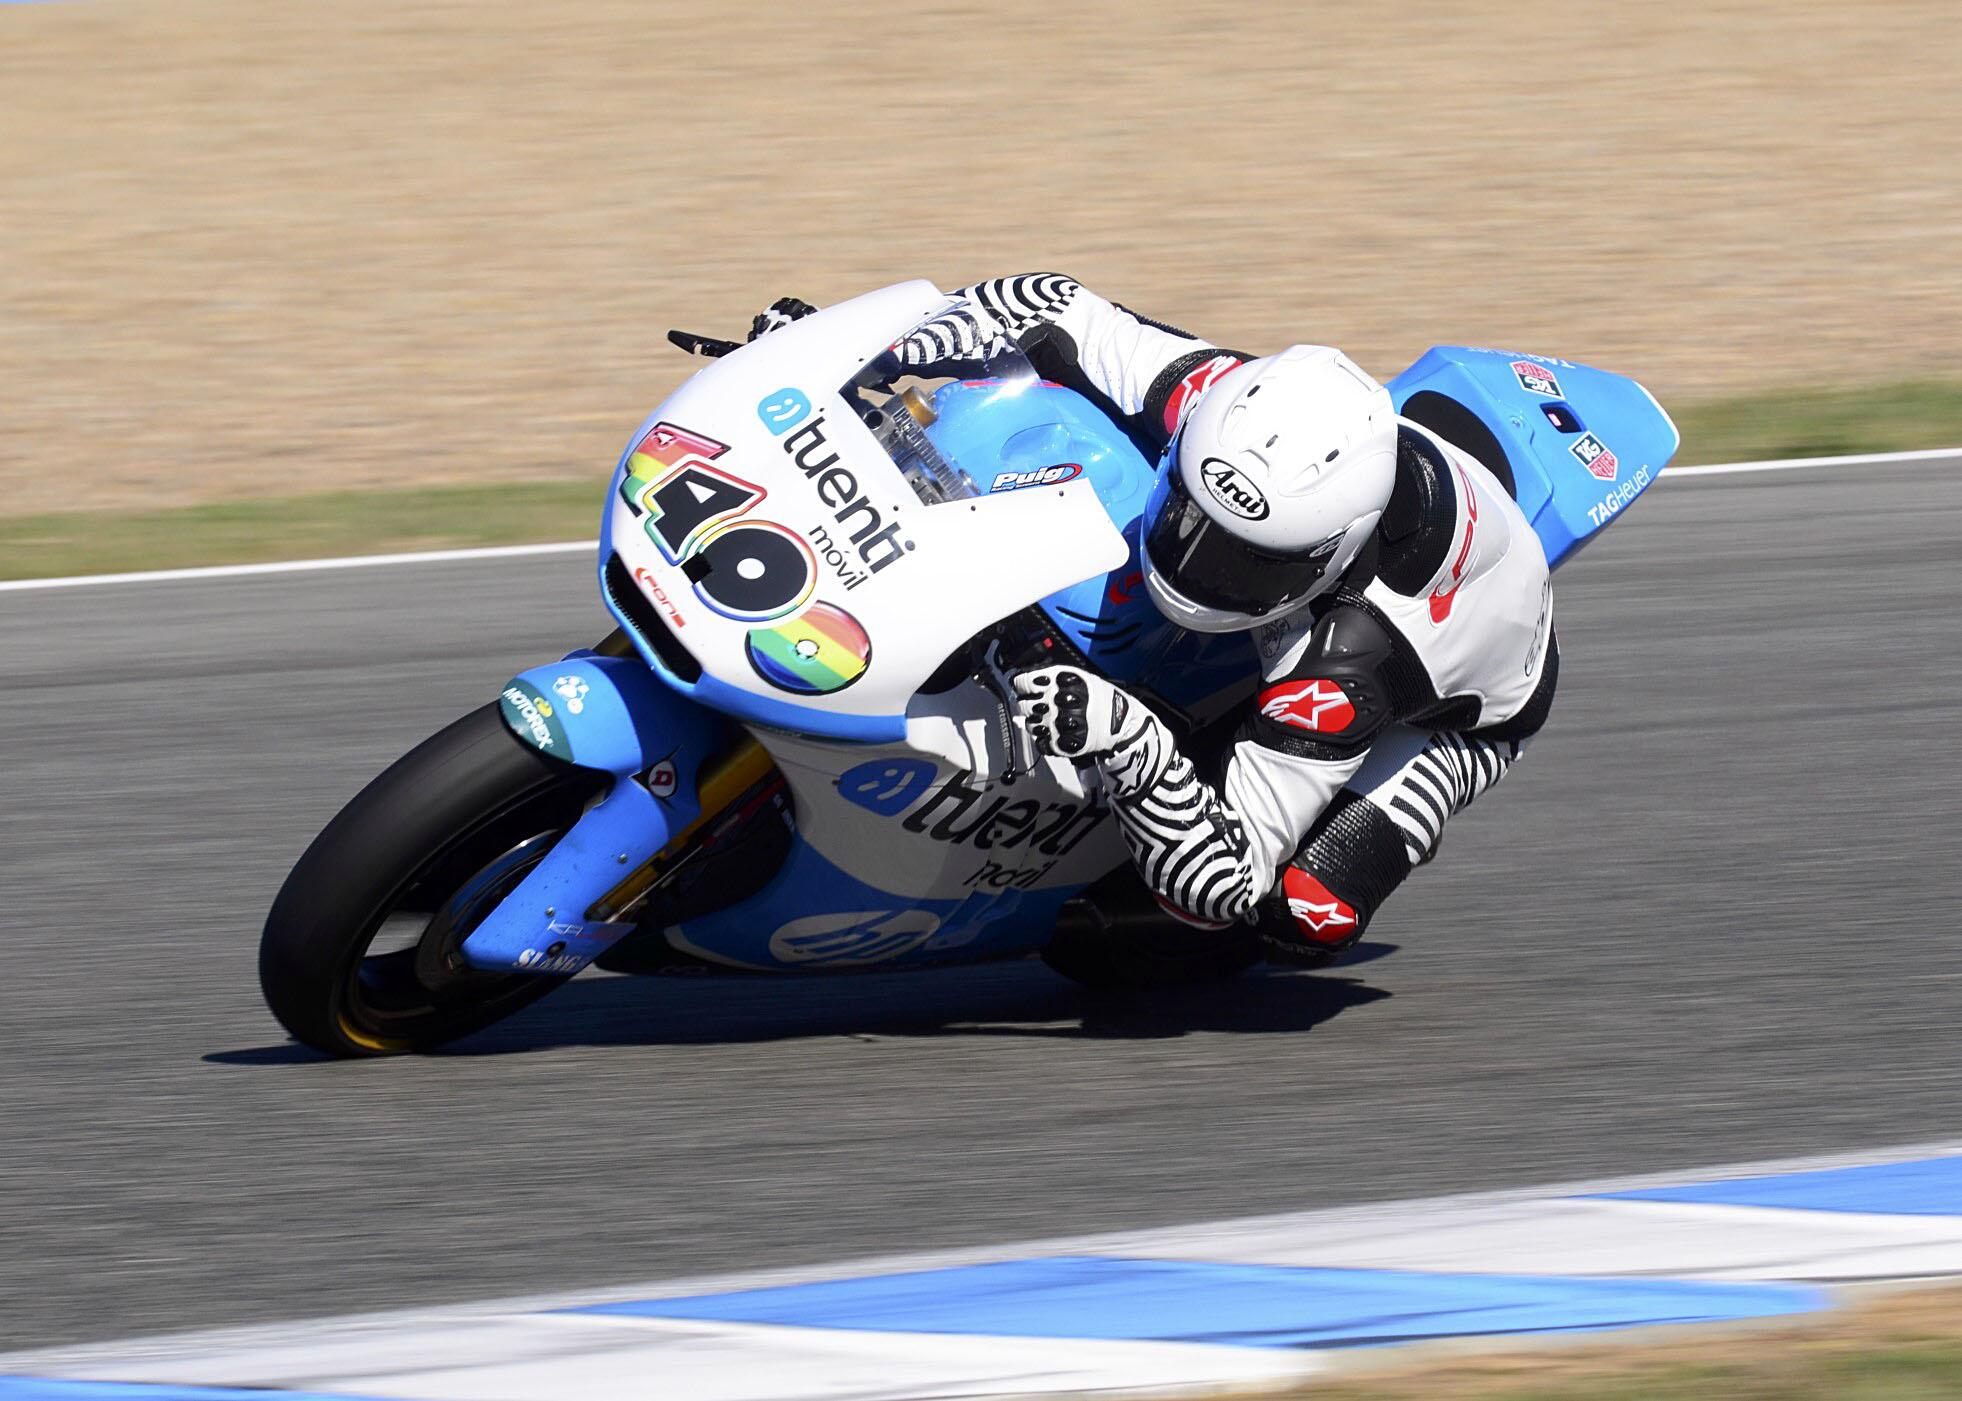 Test Moto3/Moto2 Jerez BZB8lagIEAEsW31